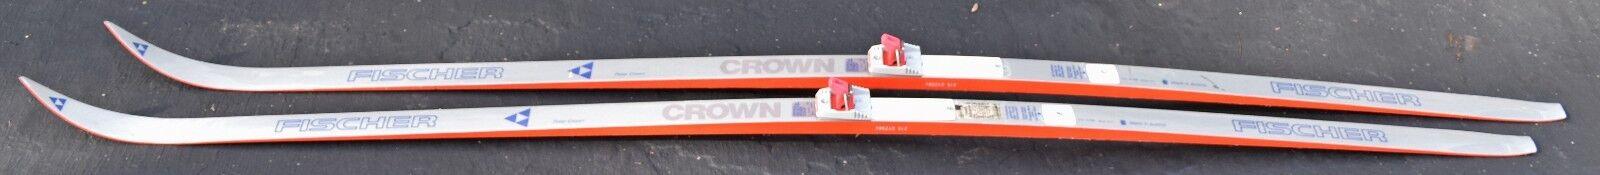 Fischer Crown 215 cm wax less cross country skis -  Salomon SNS bindings  best fashion